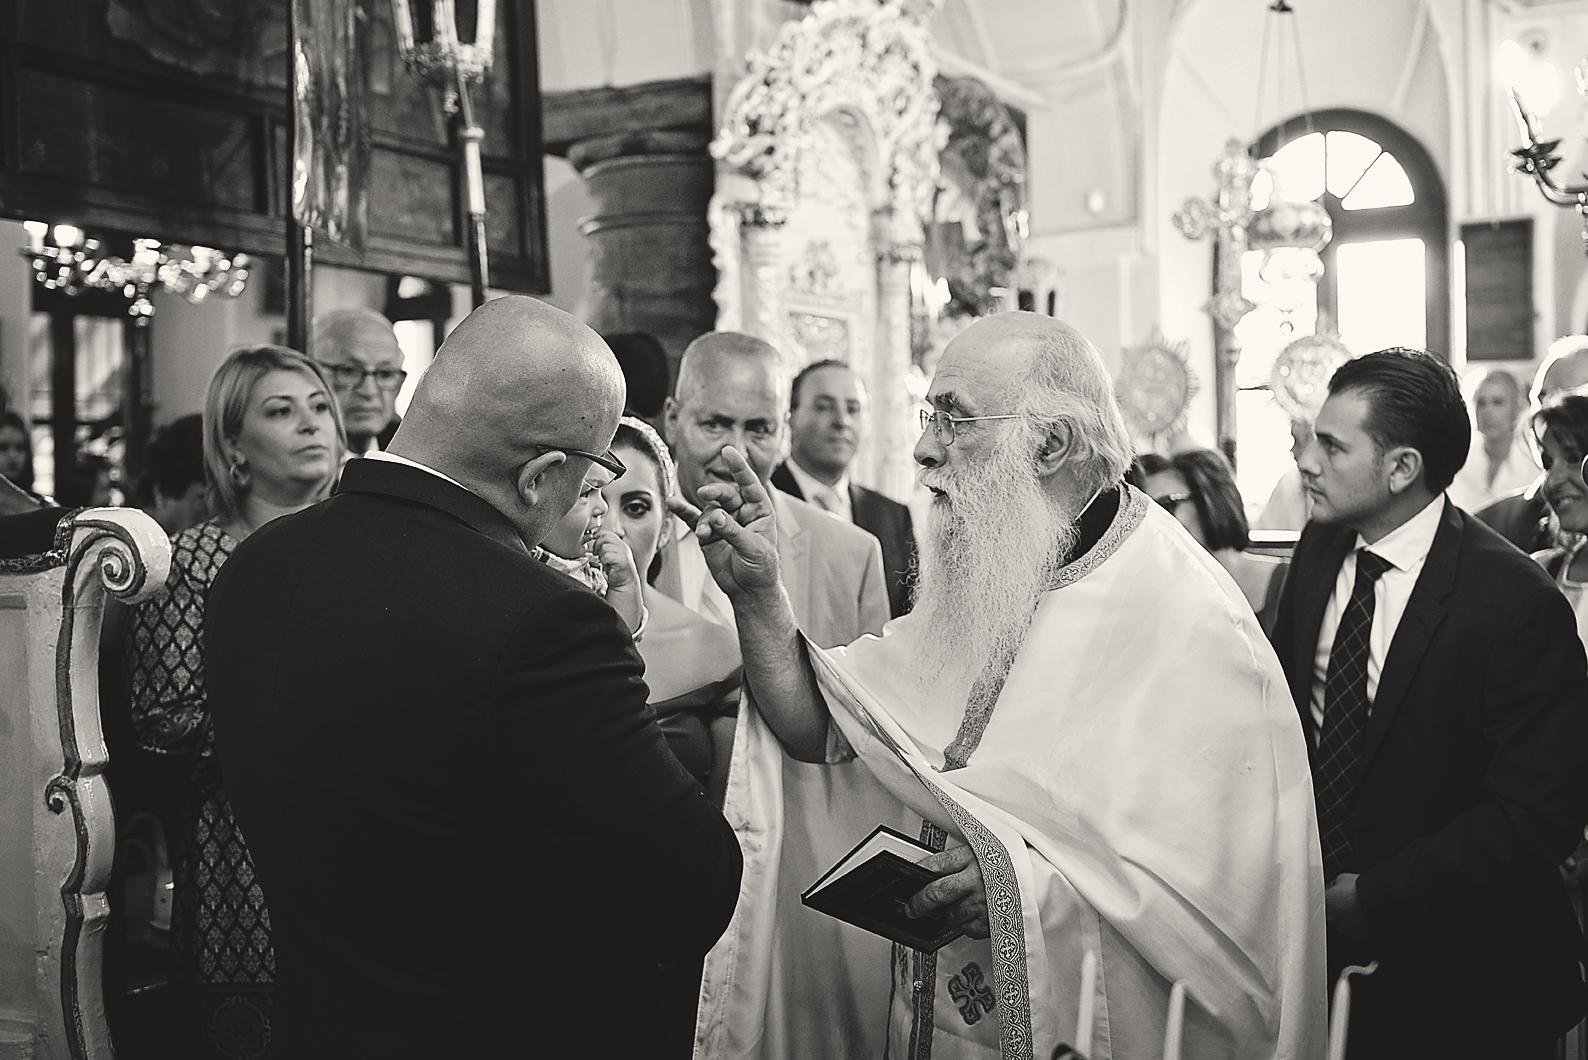 panagia-siriotissa-kampos-chios-christening-baptism-alexis-koumaditis-photography-09